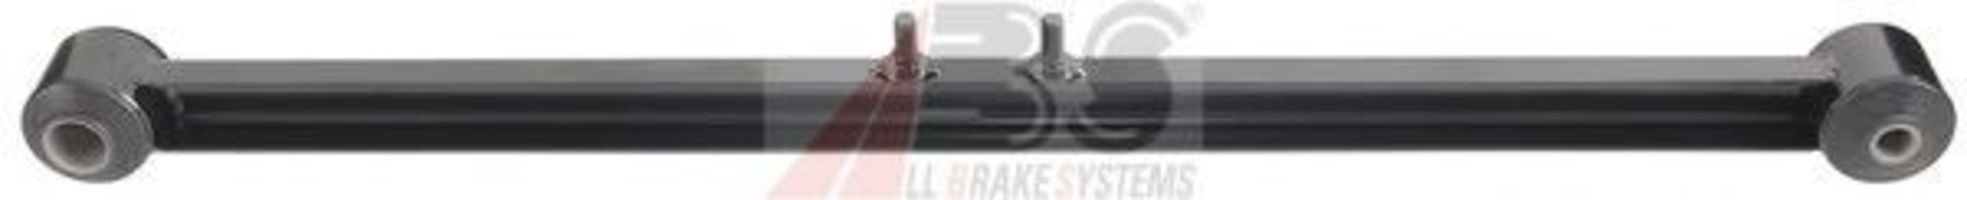 Рычаг подвески A.B.S. 211443